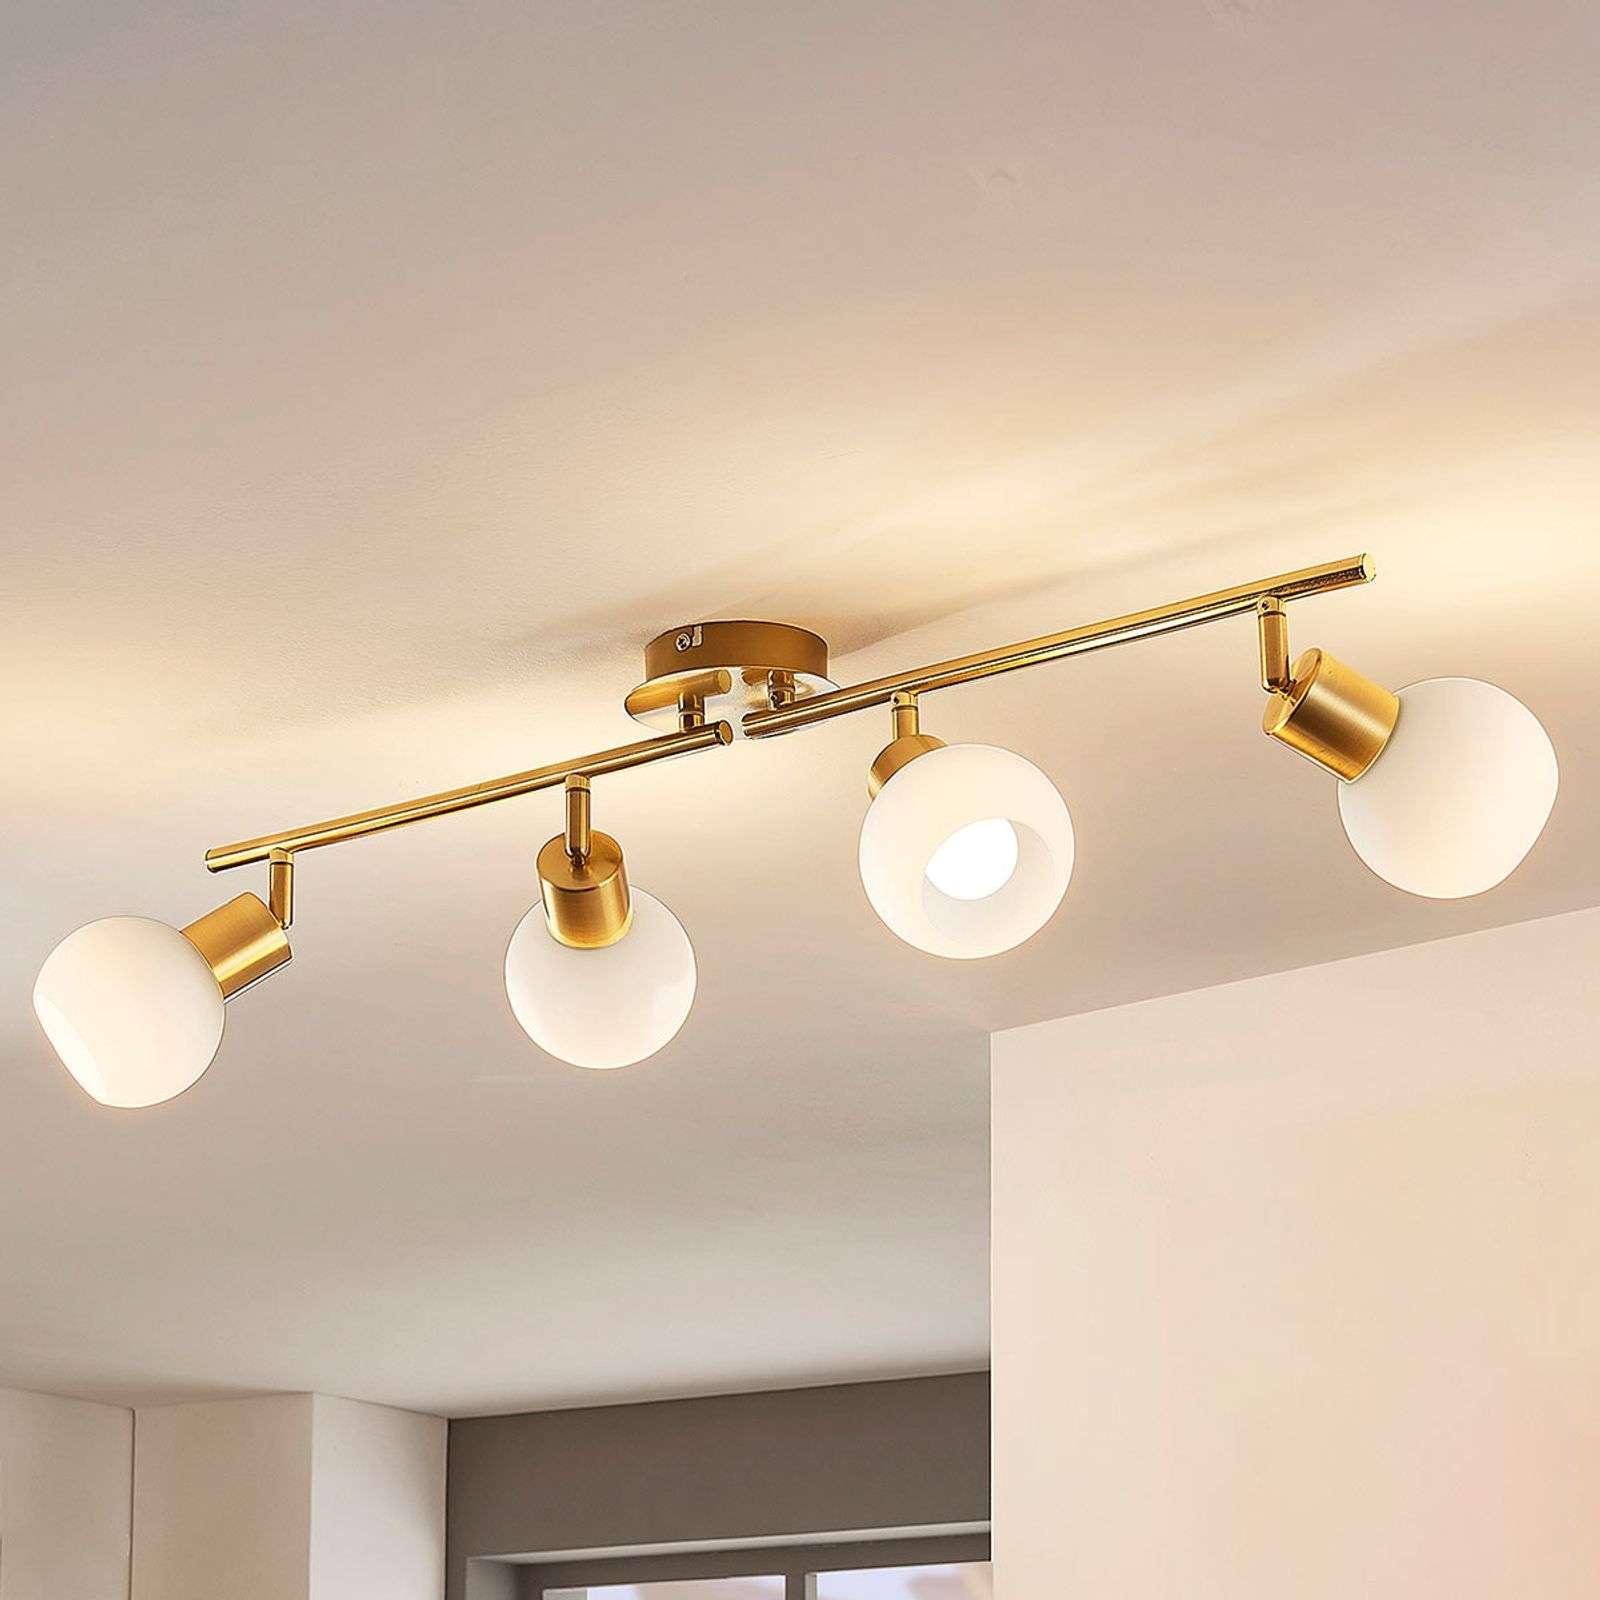 Led Deckenlampe Lampenwelt